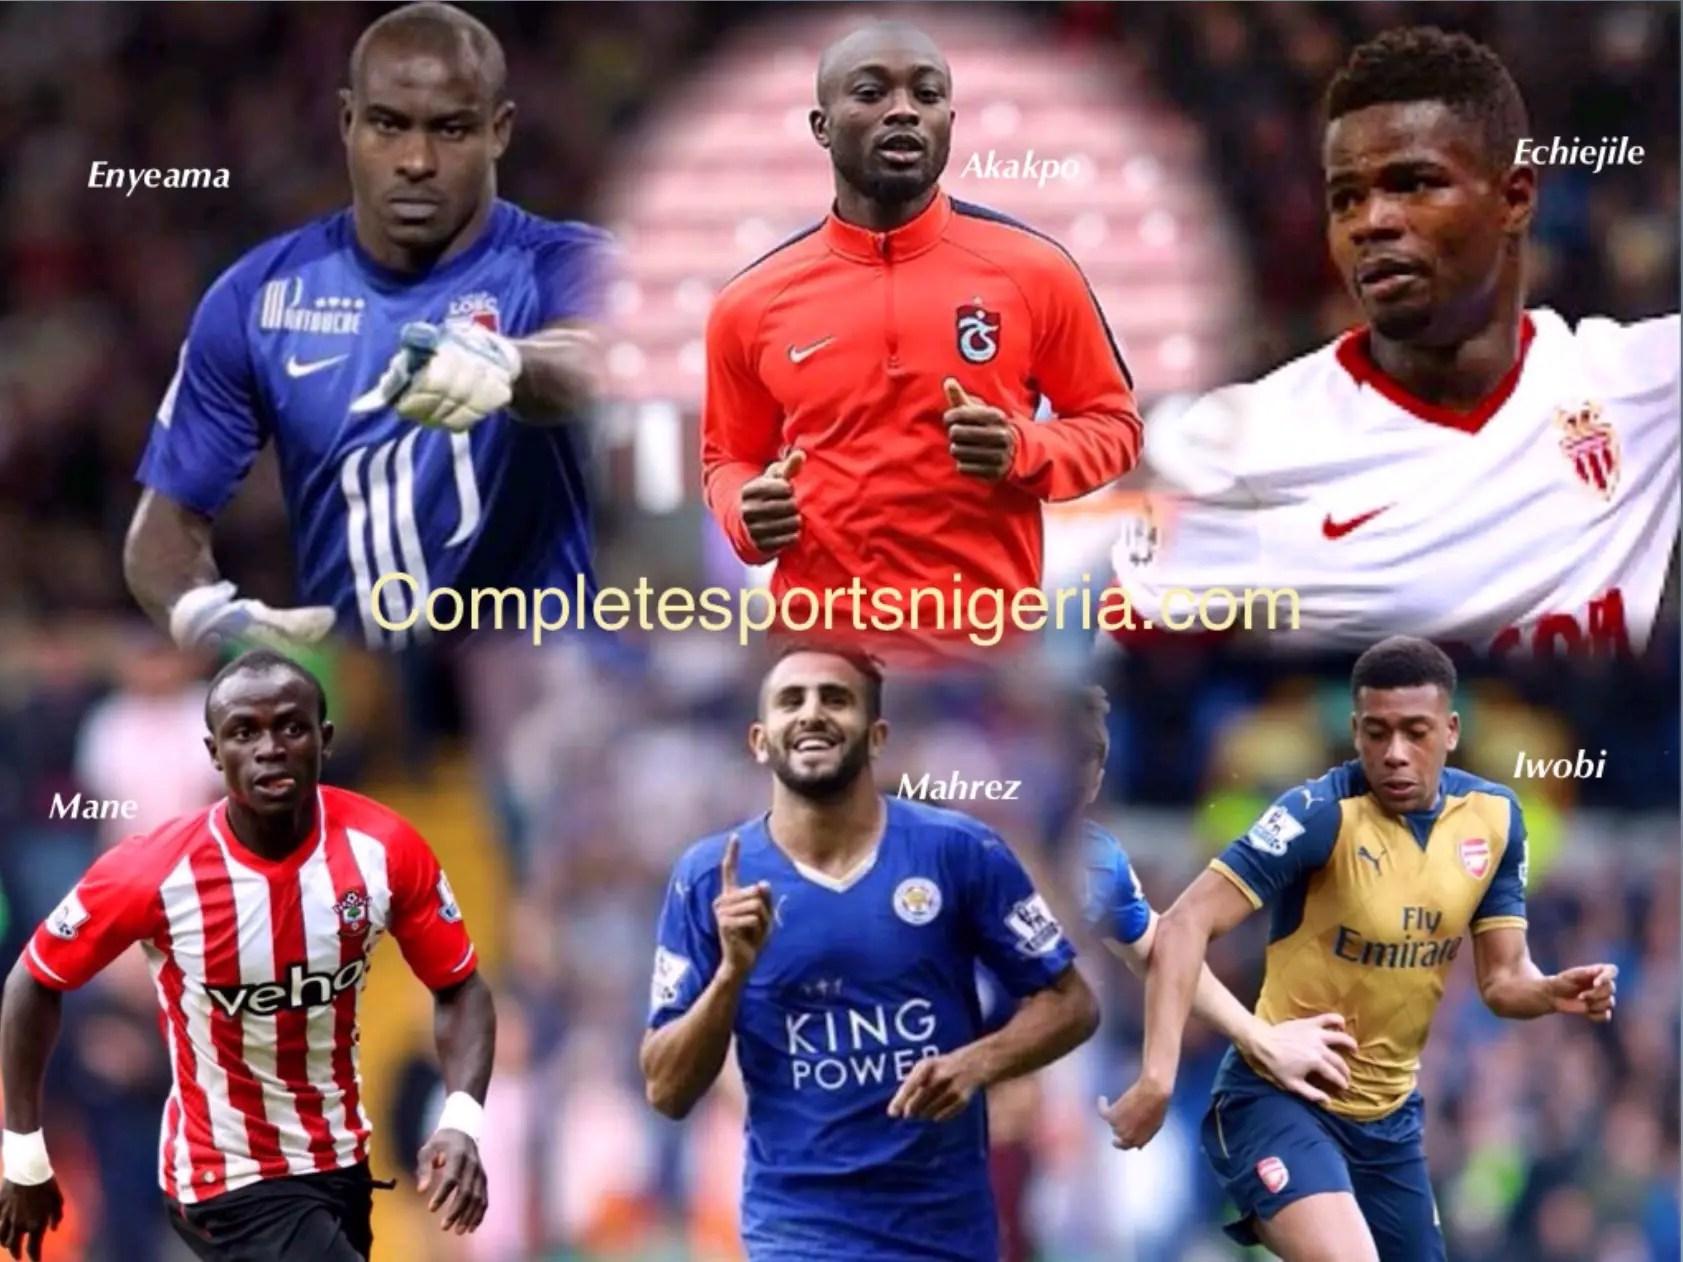 Enyeama, Mane, Echiejile, Mahrez, Iwobi  Make African Team Of The Week